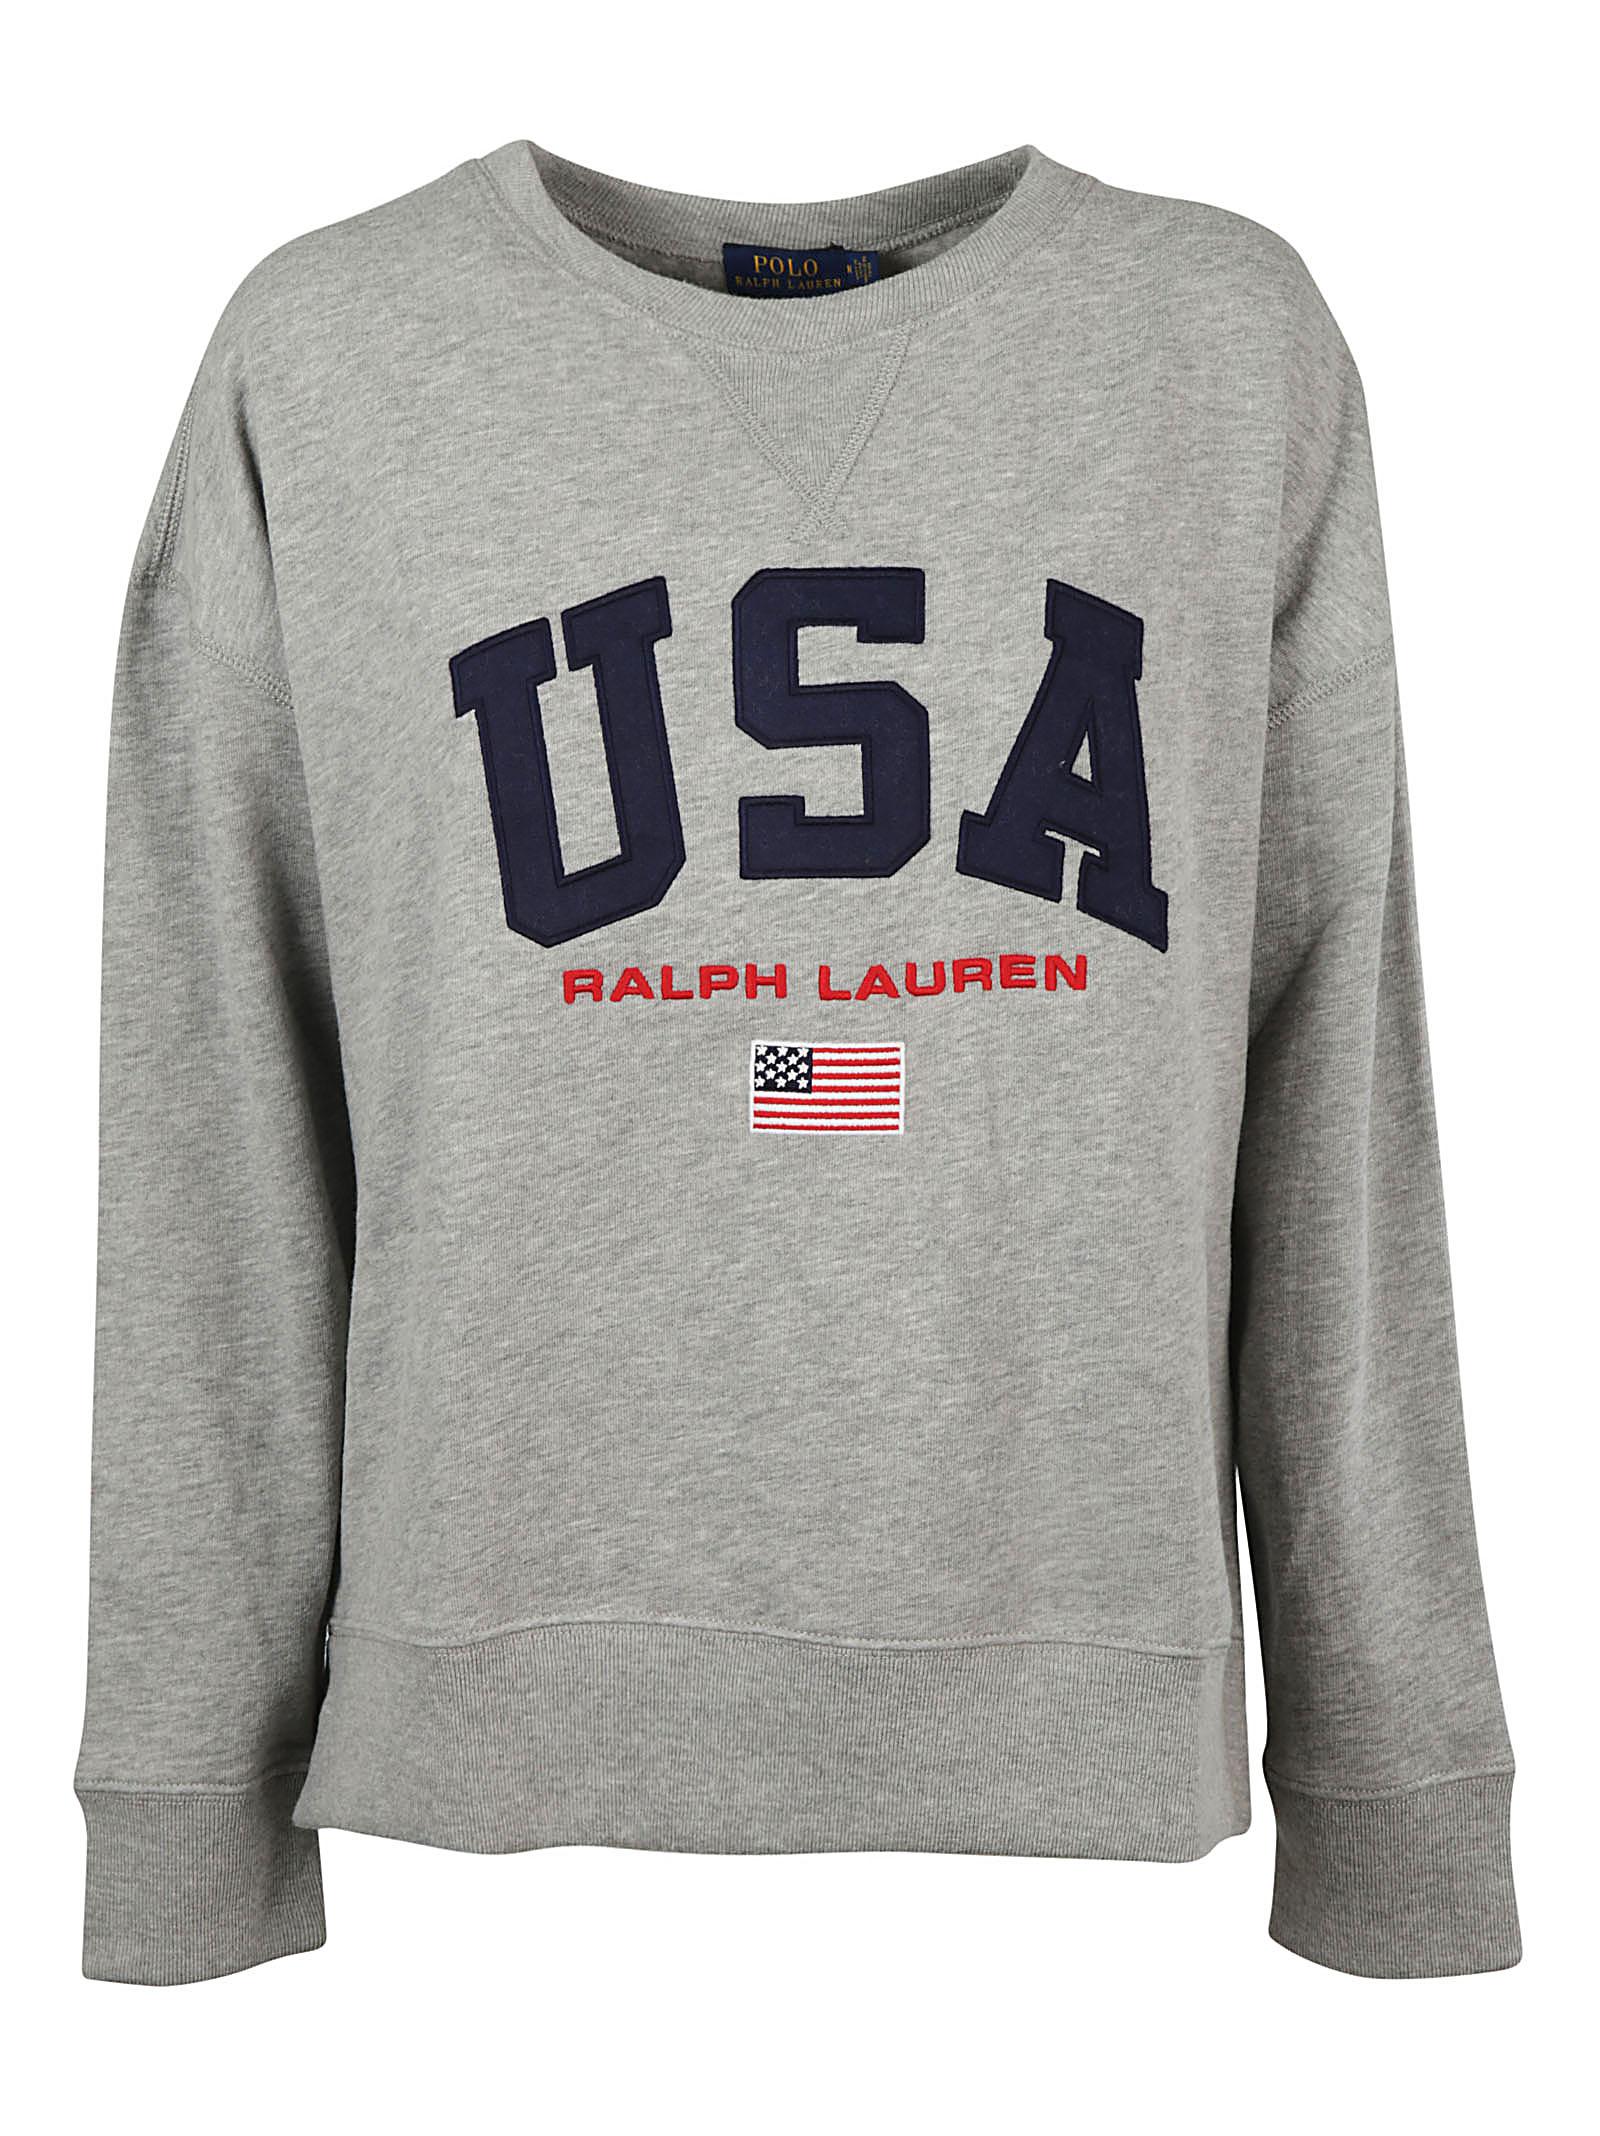 Polo Ralph Lauren Kläder   Accessoarer  6d37a85de1eef